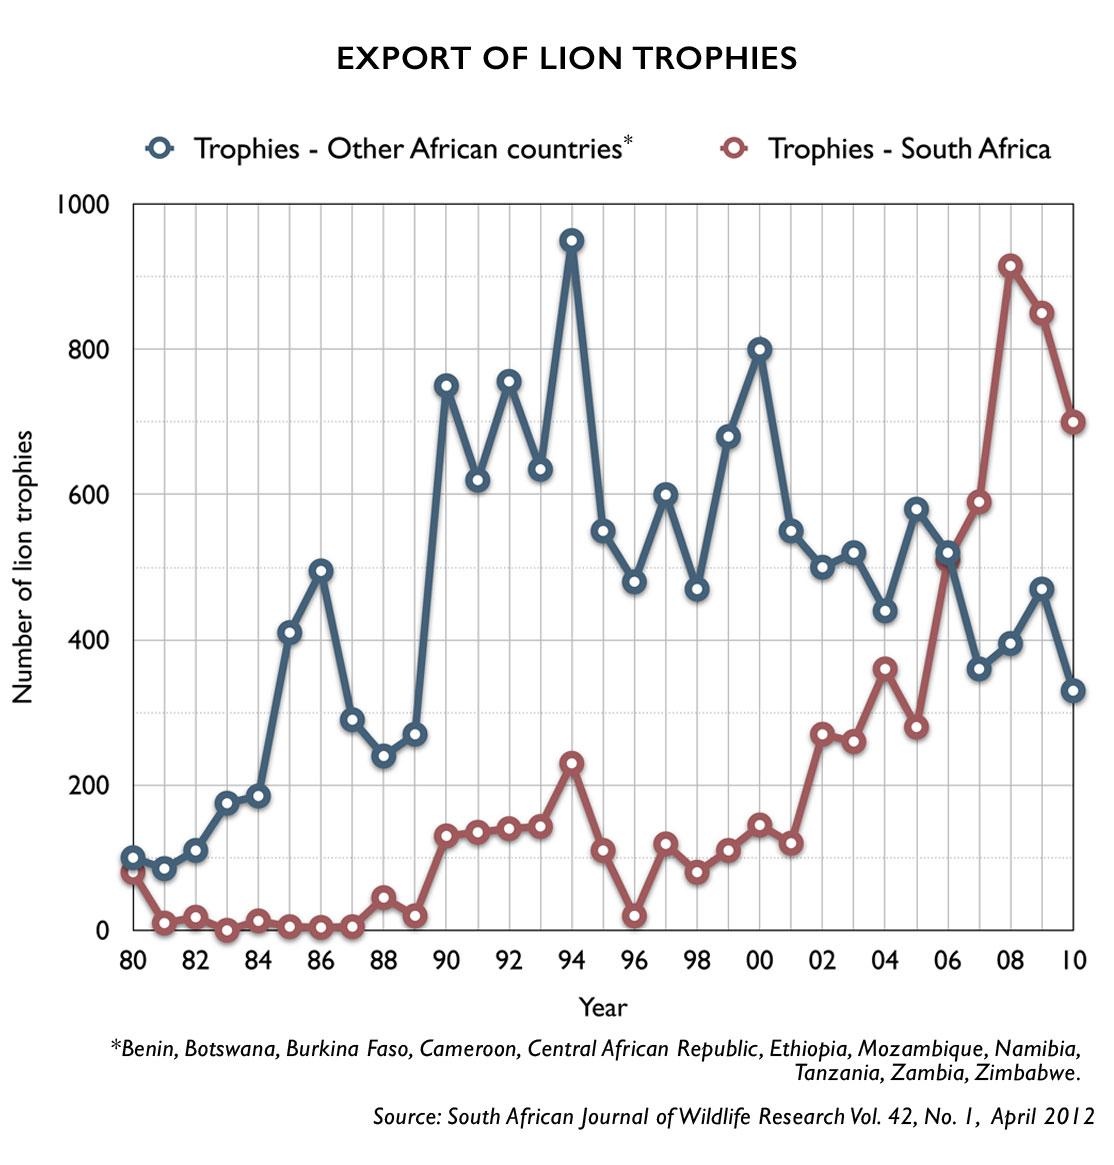 lion-trophy-exports